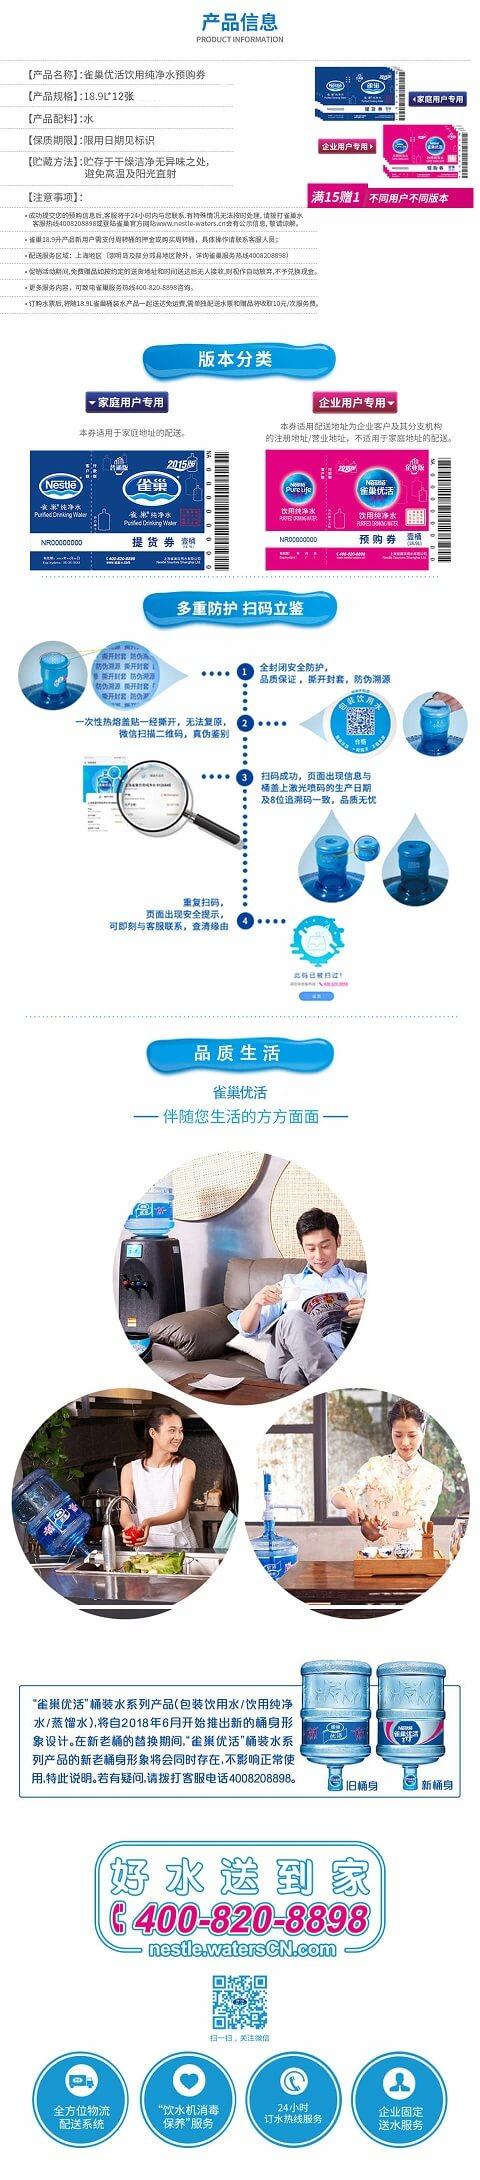 chunjing12detail.jpg